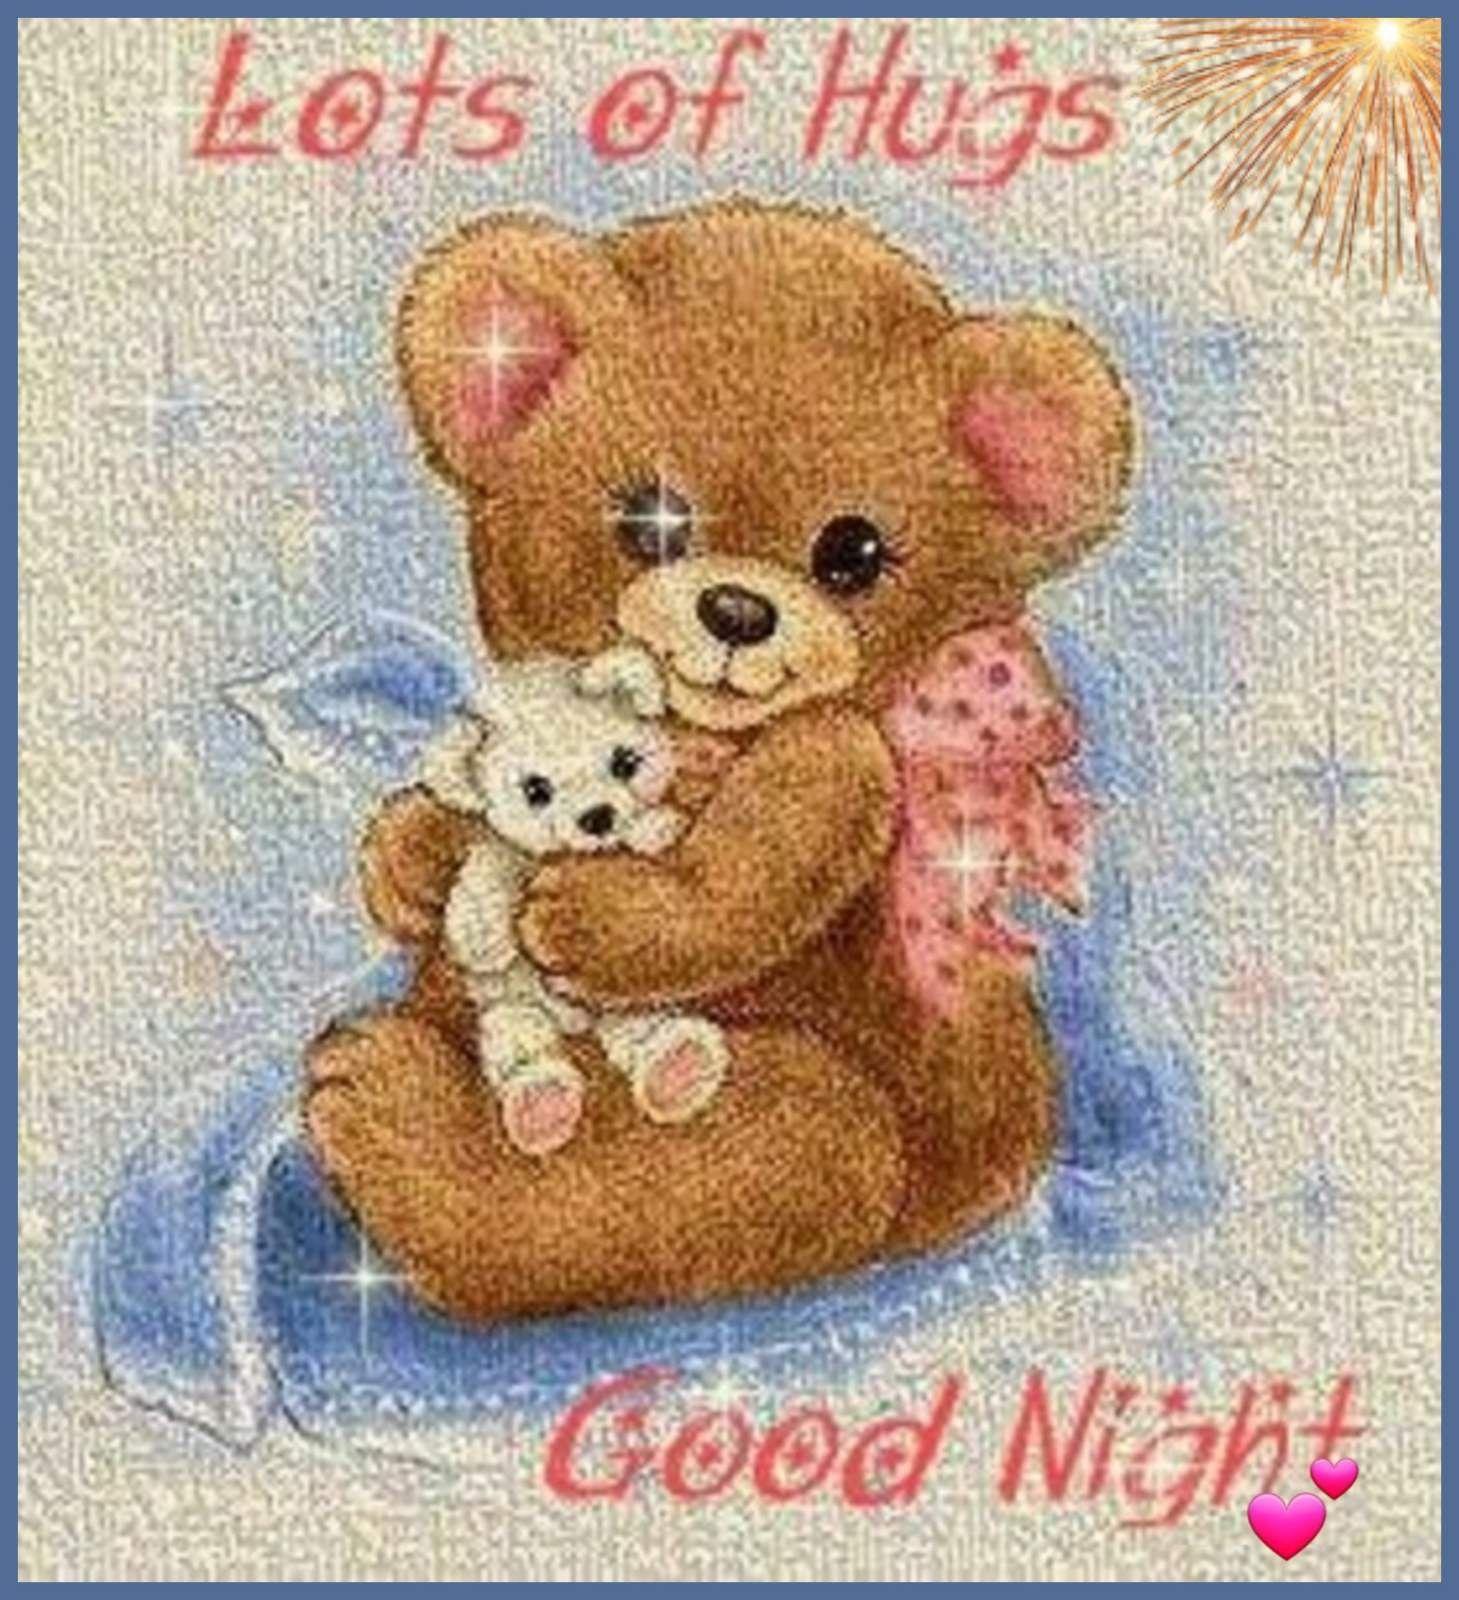 Pin by Shawn on good night in 2020 | Good night hug, Good night greetings, Good  night